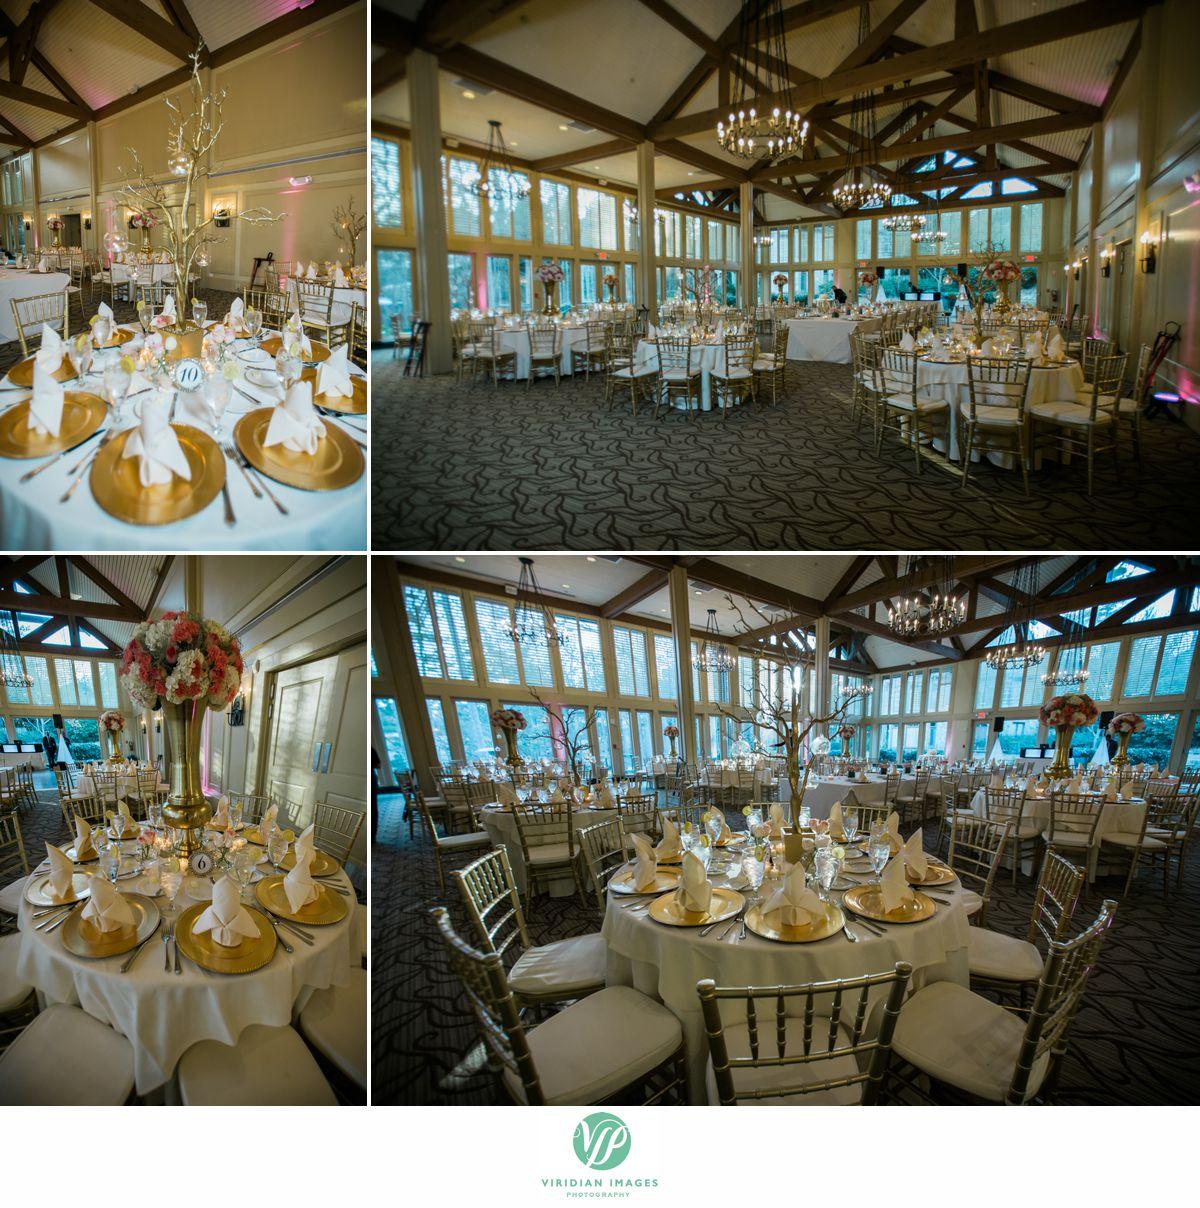 Country Club of the South Johns Creek GA Wedding reception setup photo 16